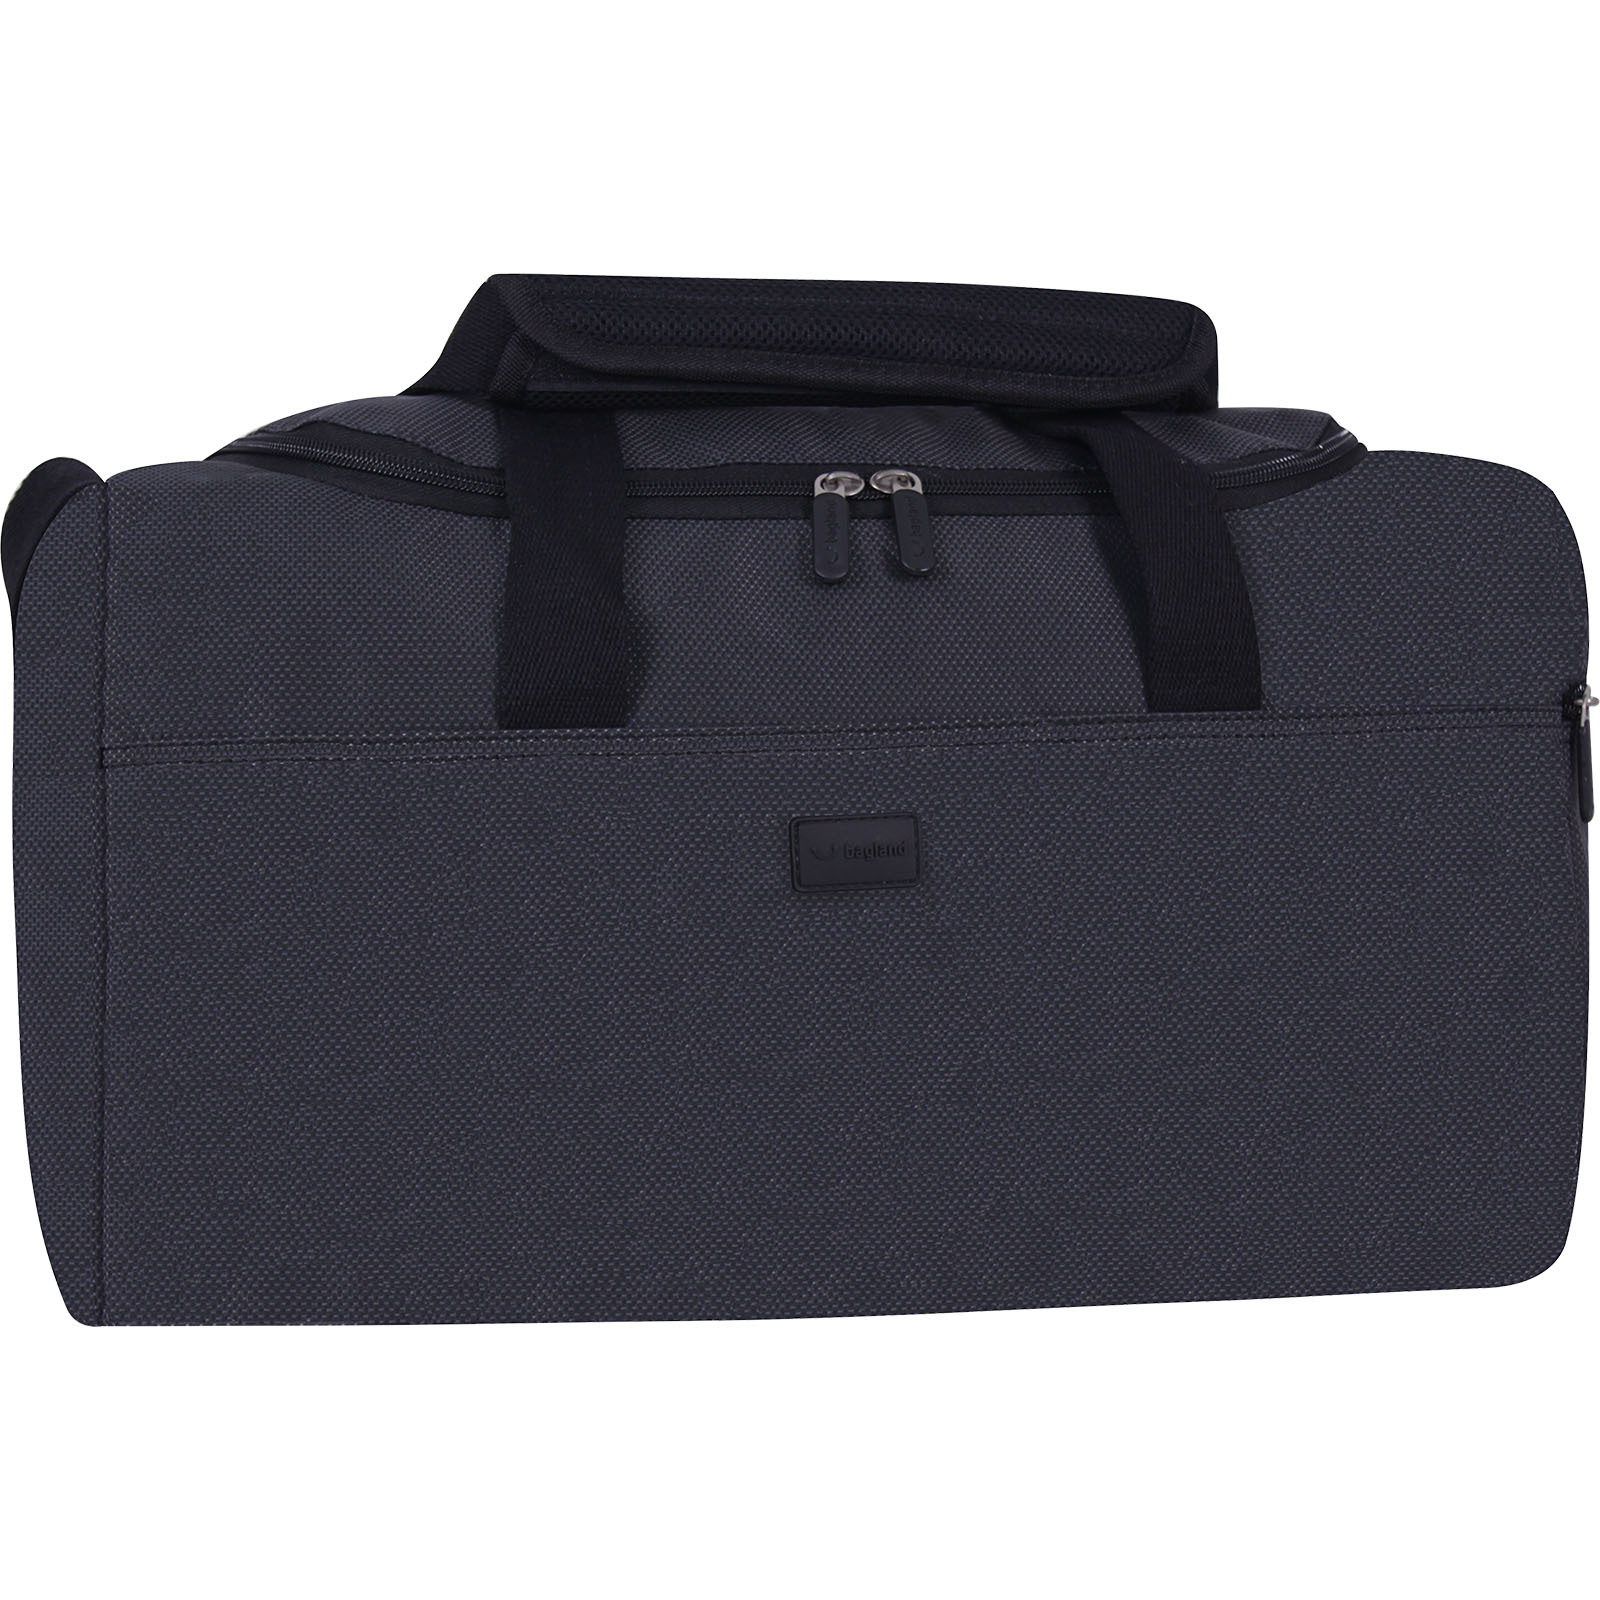 Дорожные сумки Сумка Bagland Boston 25 л. Чёрный (00374169) IMG_7192-1600.jpg